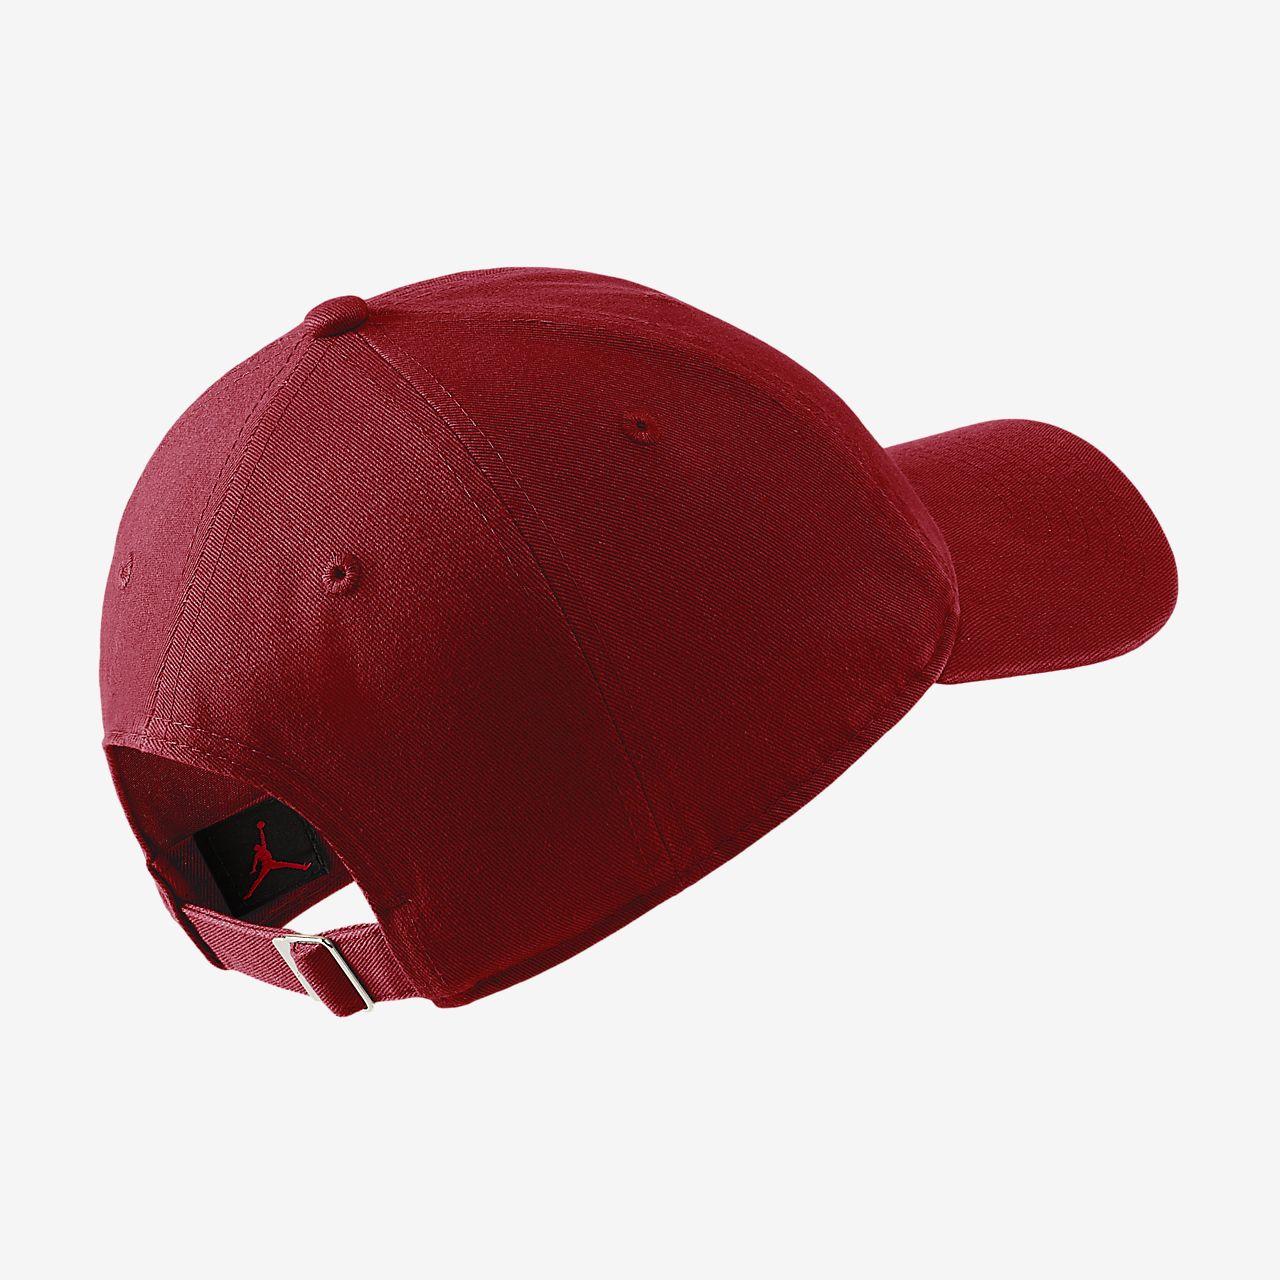 c9472be994d ... closeout jordan jumpman heritage 86 adjustable hat 00e49 0e0fb